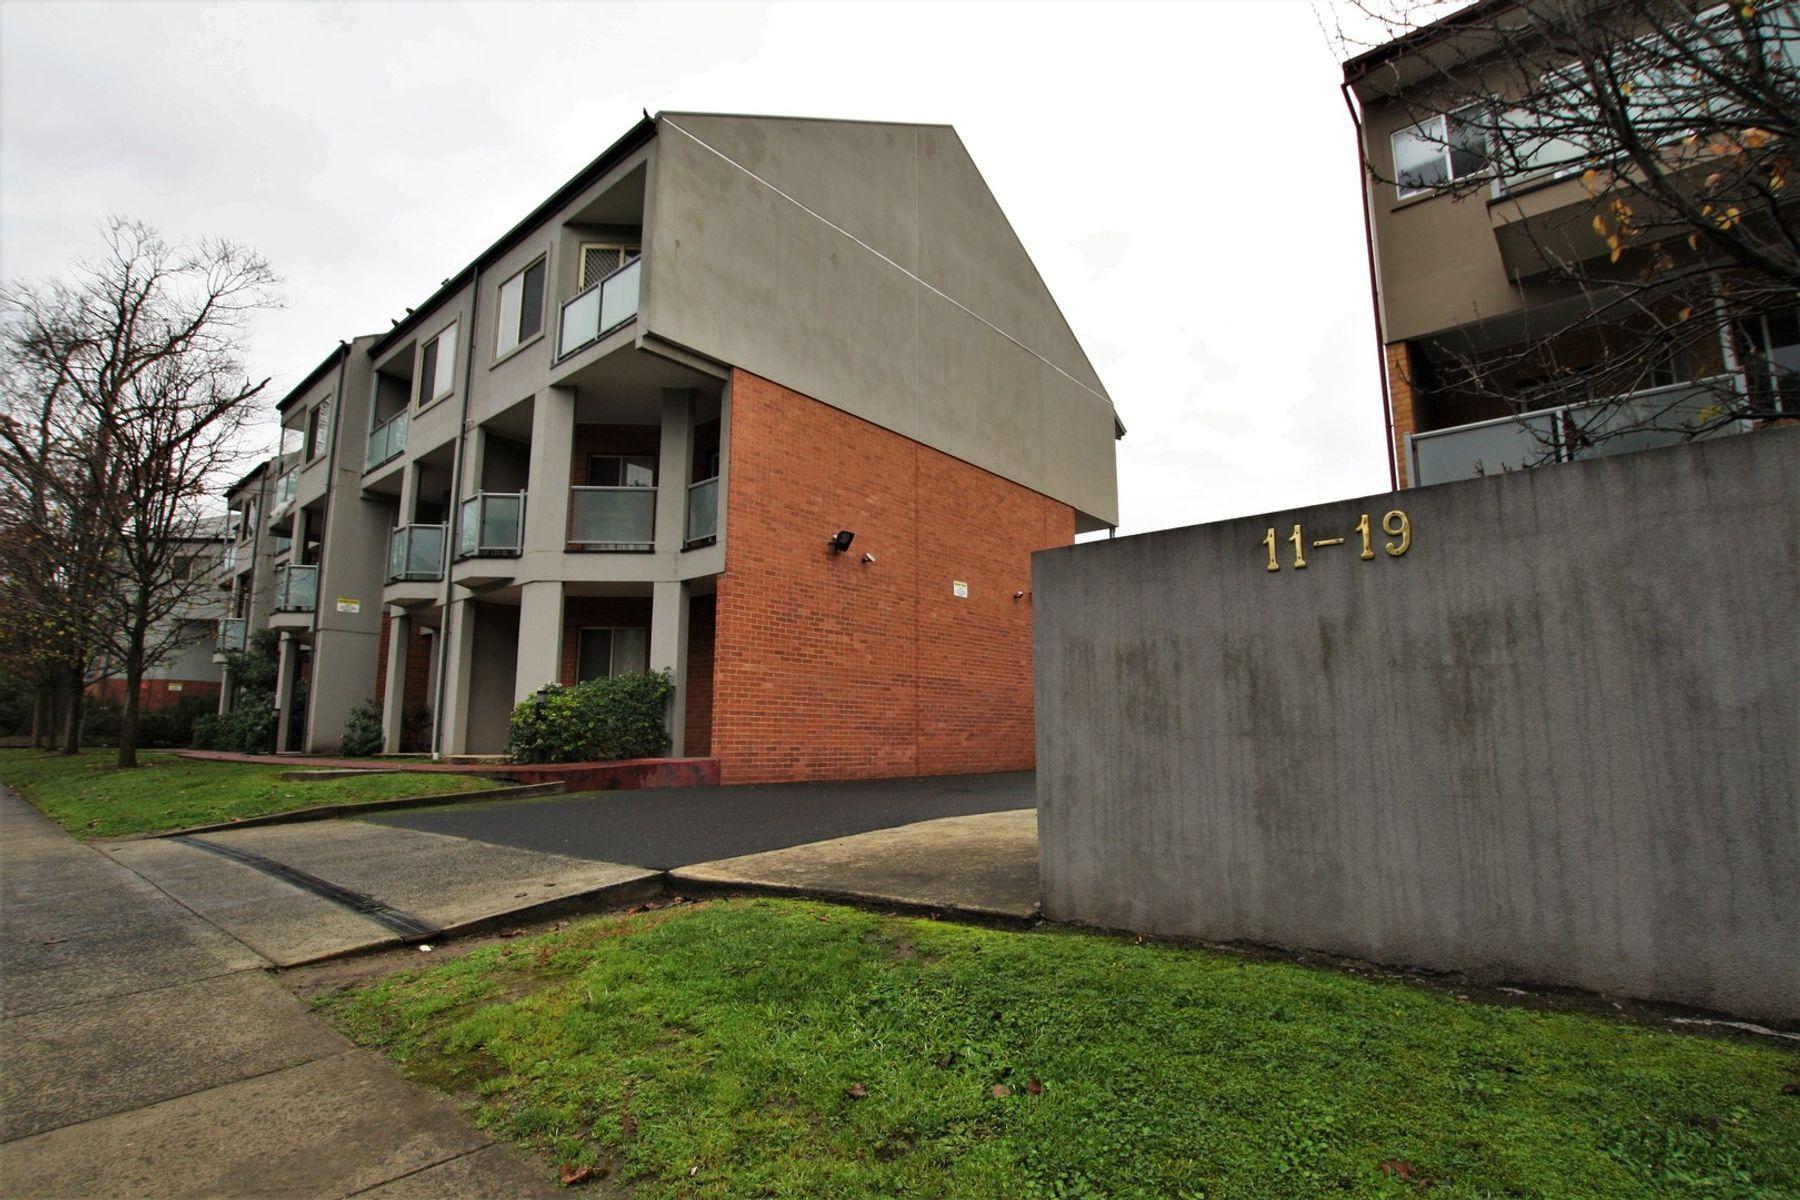 83/11-19 Hewish Road, Croydon, VIC 3136